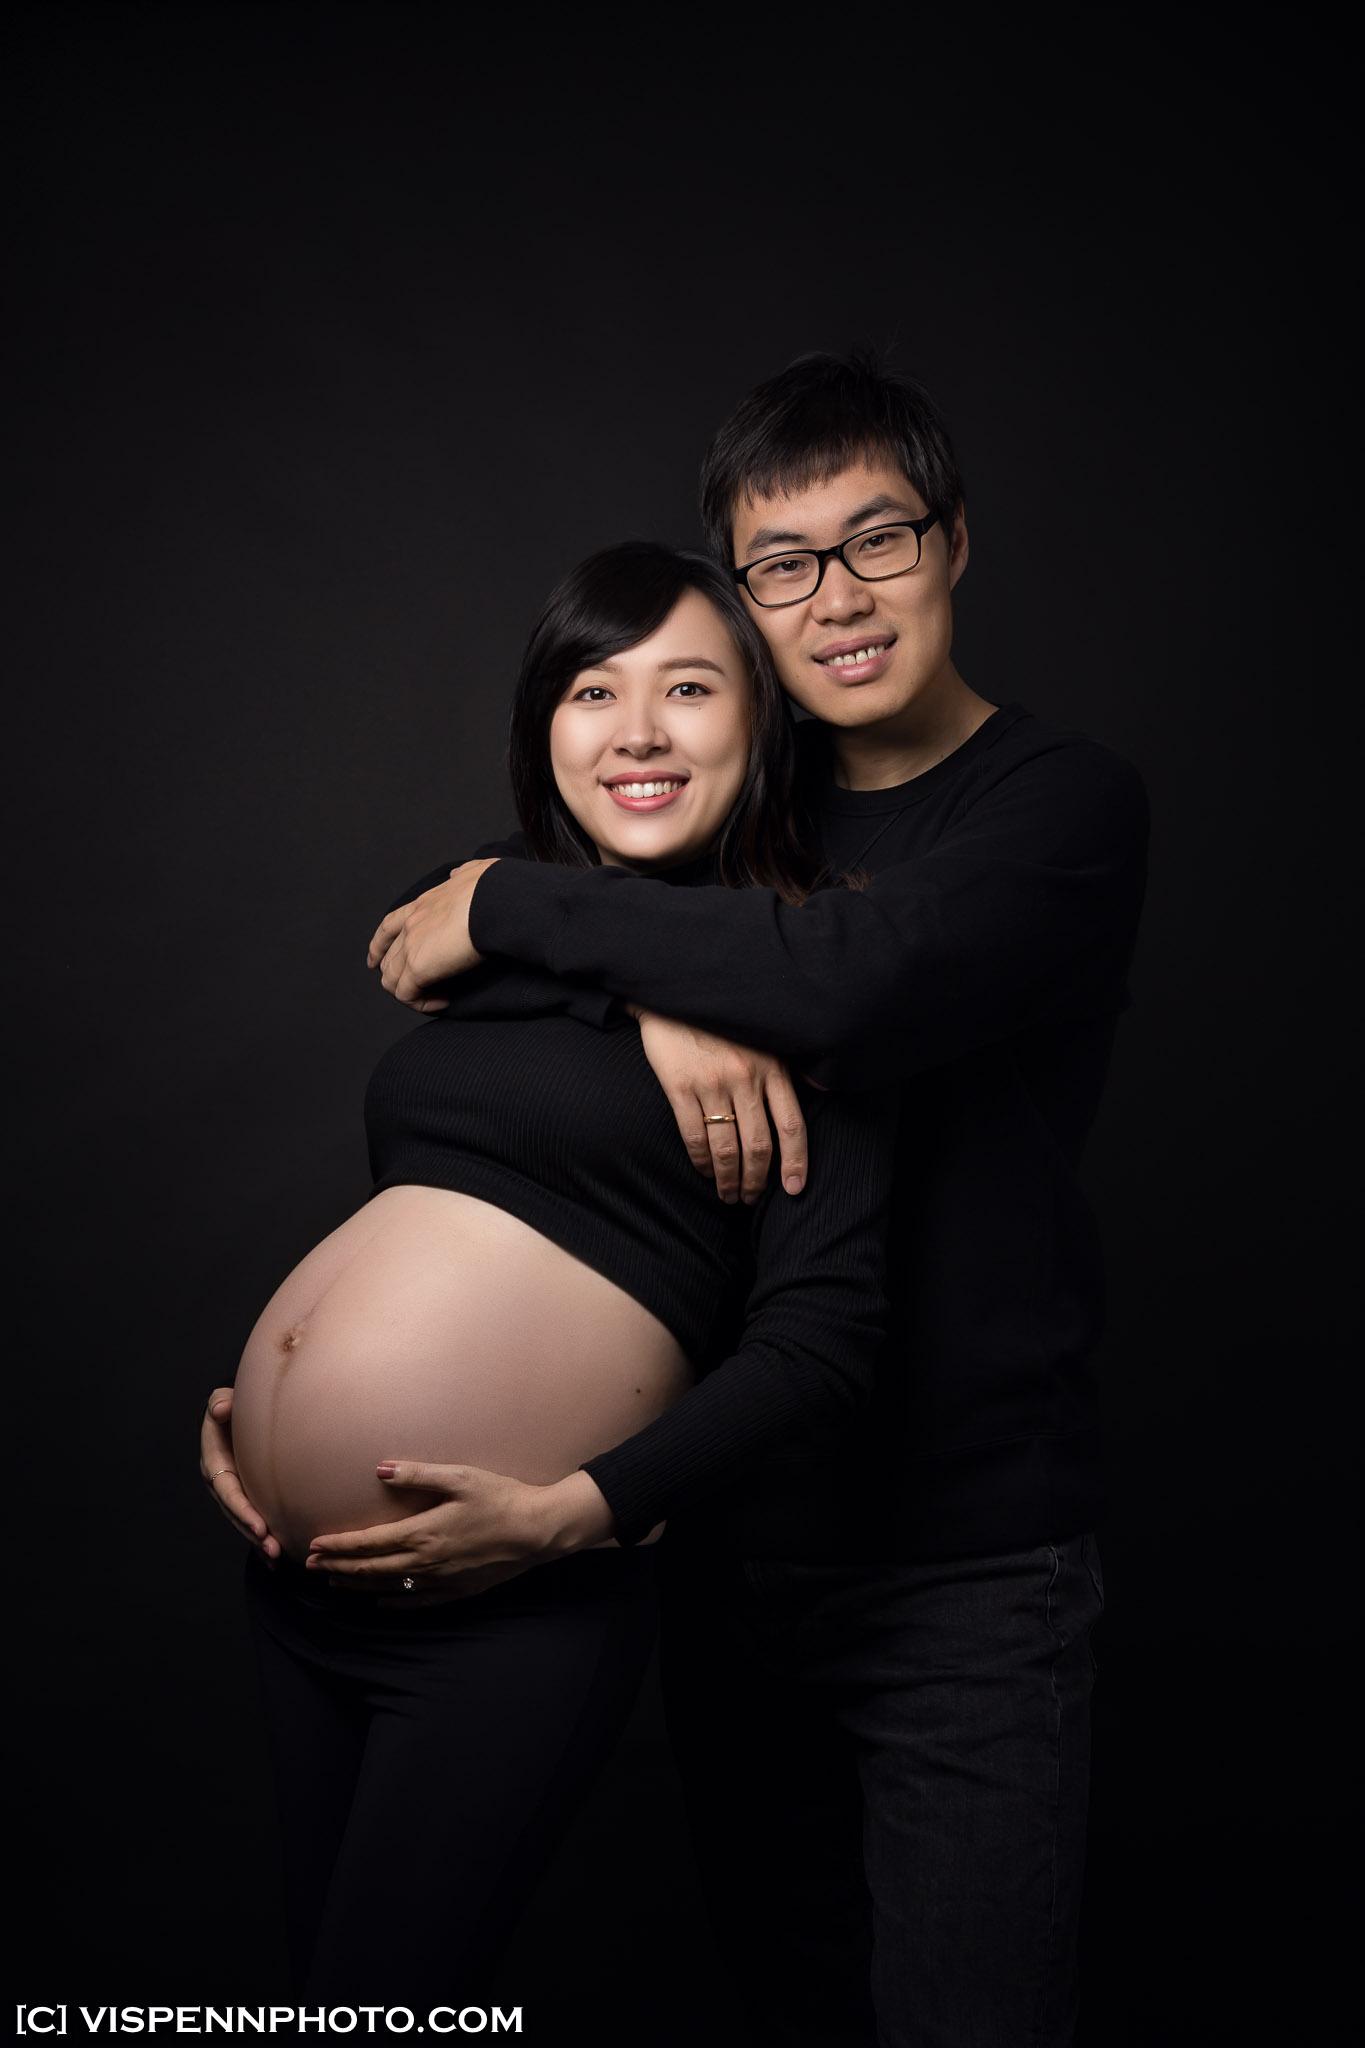 Melbourne Newborn Baby Maternity Family Photo VISPENN 墨尔本 孕妇照 大肚照 QinLIU 1462 VISPENN